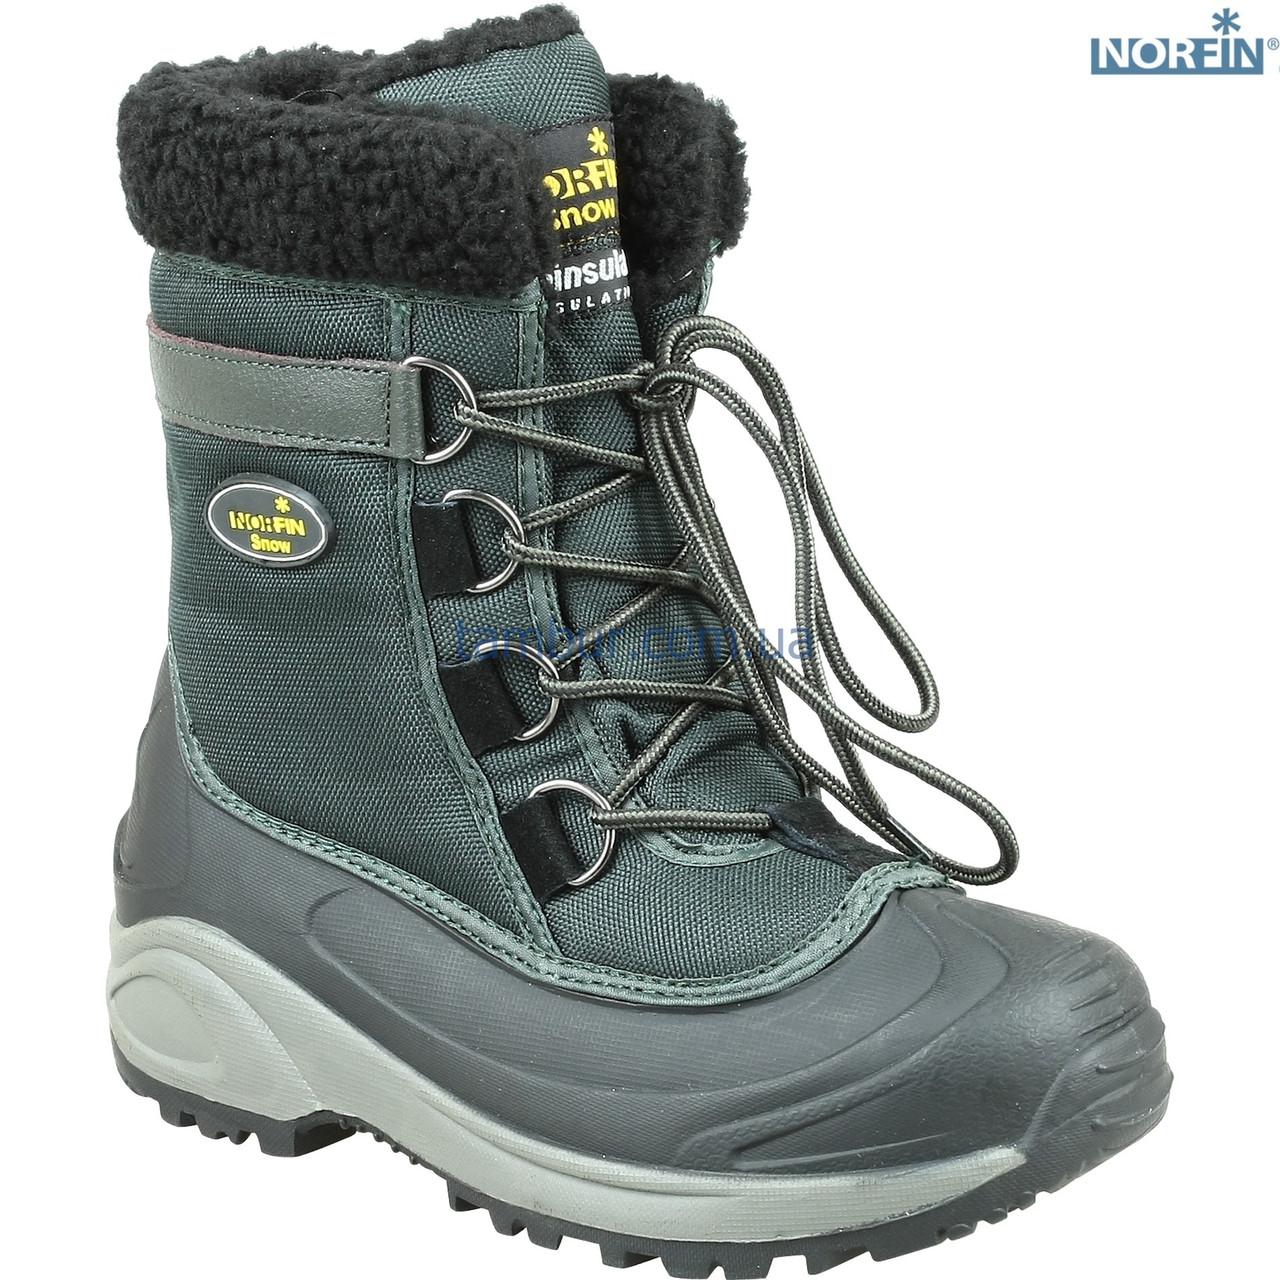 ... Ботинки зимние Norfin Snow -20°C 05a8345c19672